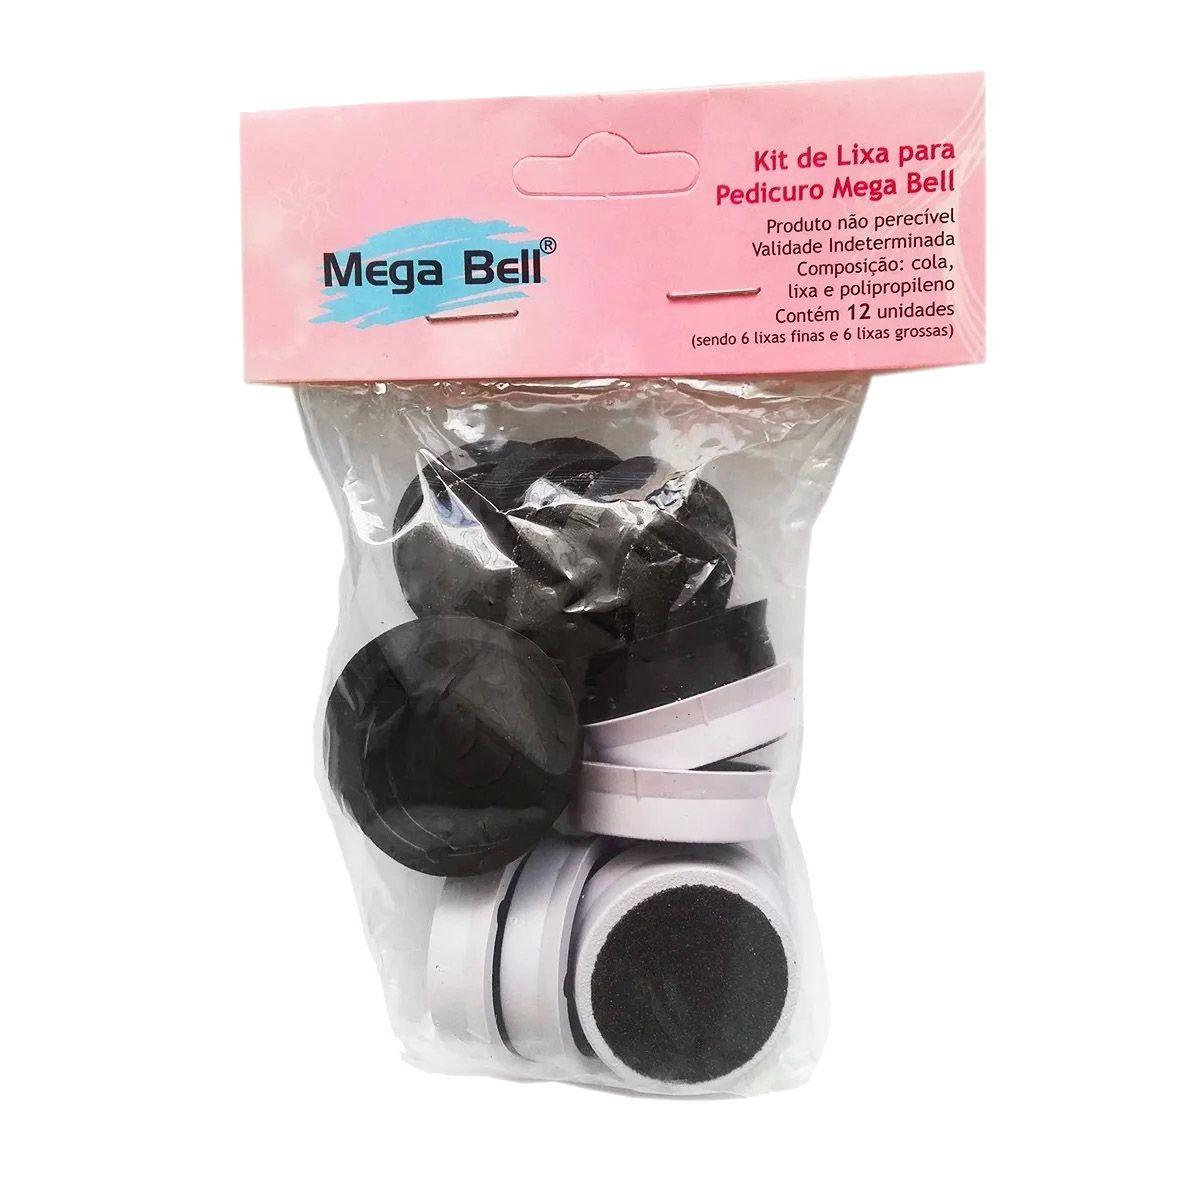 Refil Lixa Pedicuro Megabell - 12 Lixas